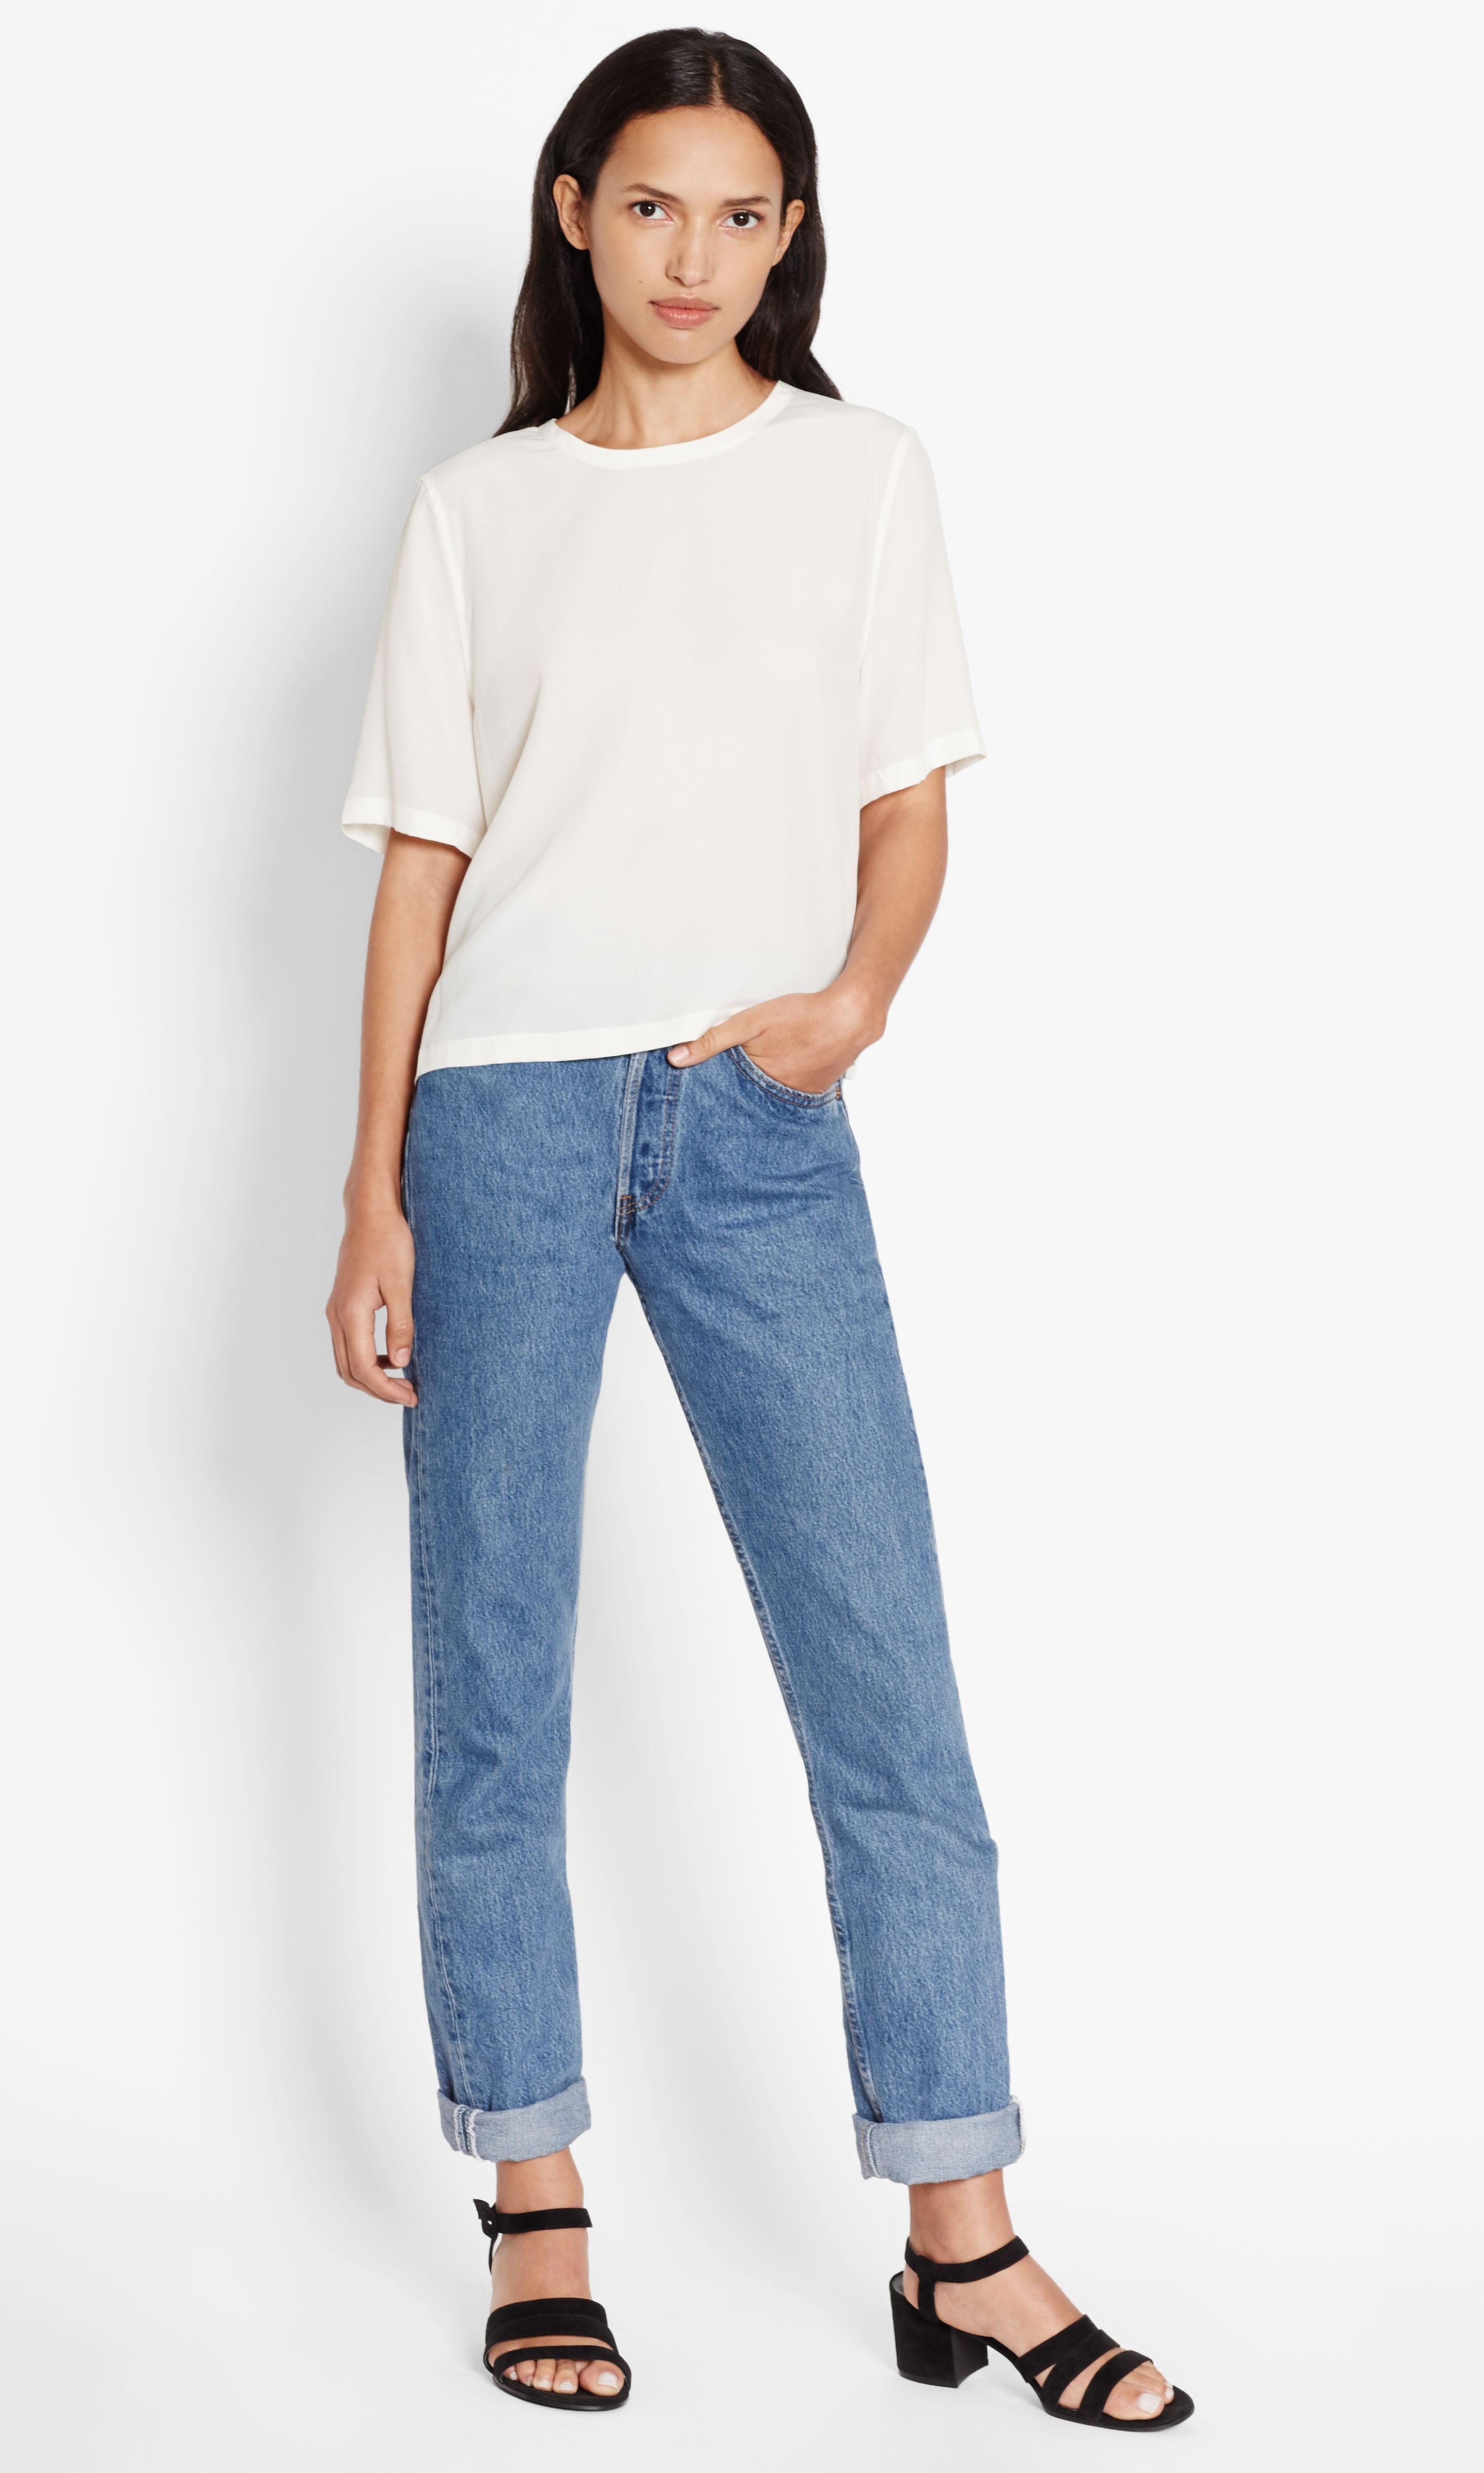 Women's Designer Short Sleeve Shirts.